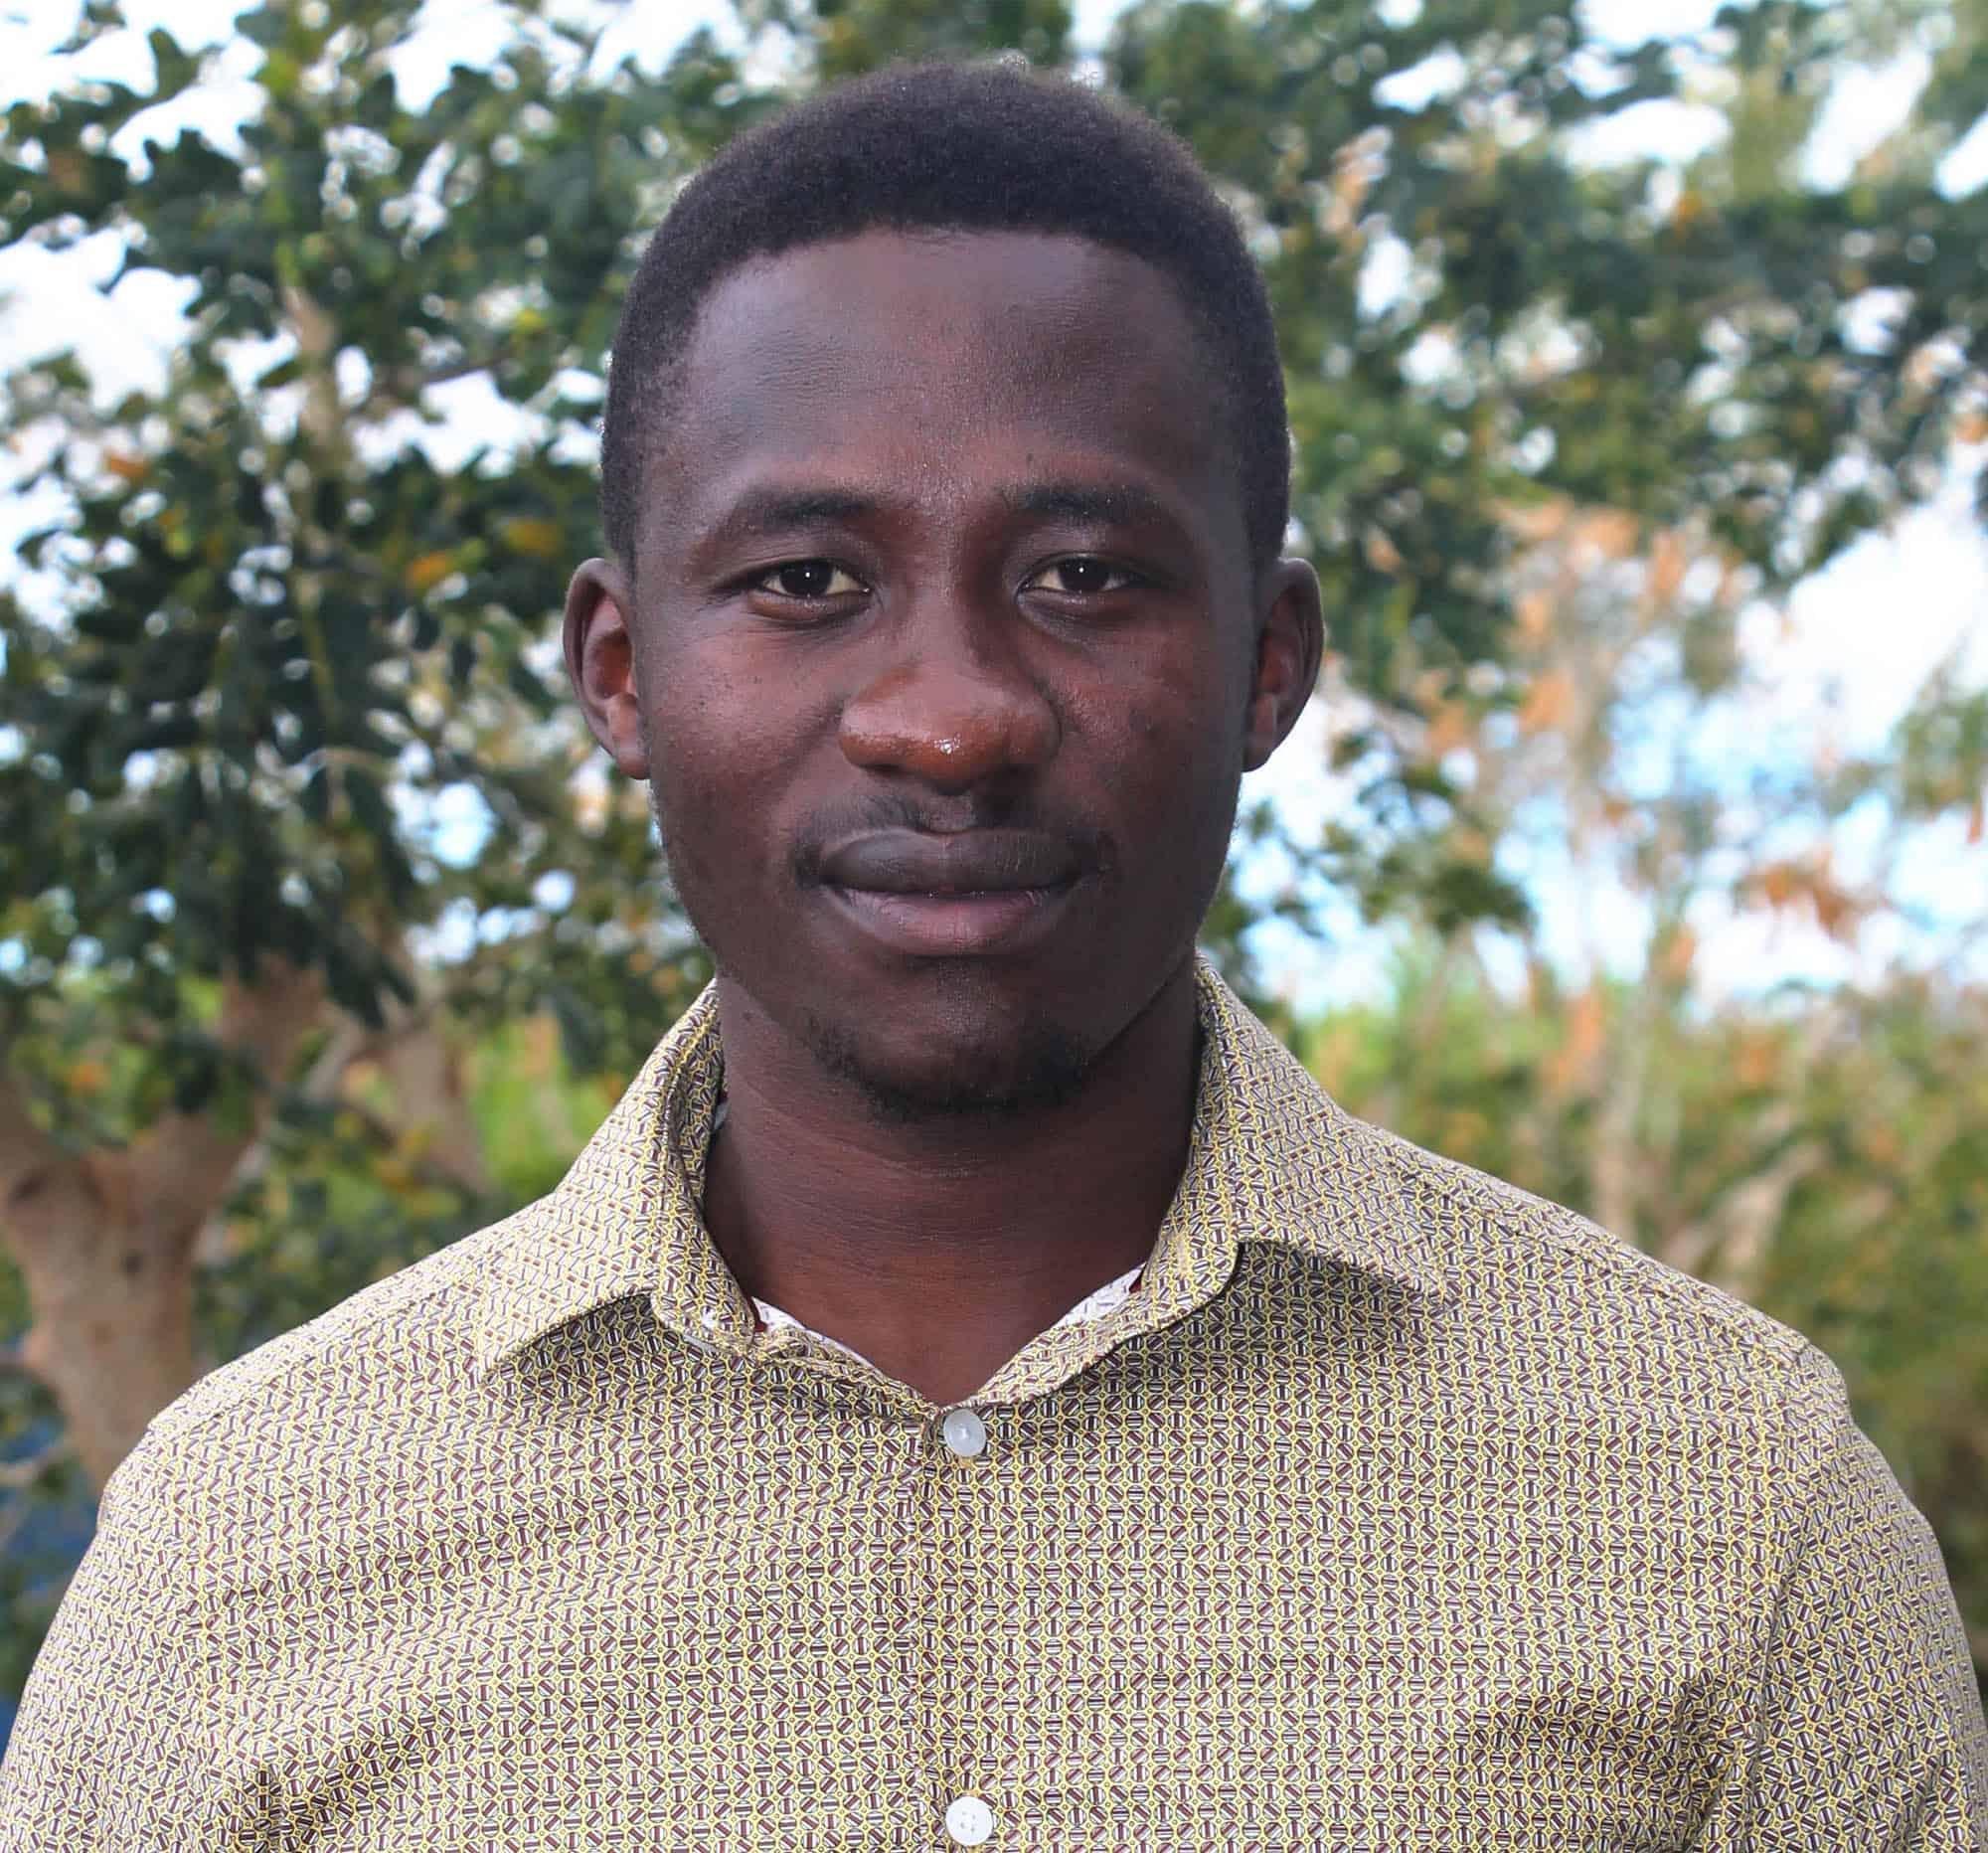 Emmanuel Okorwoit